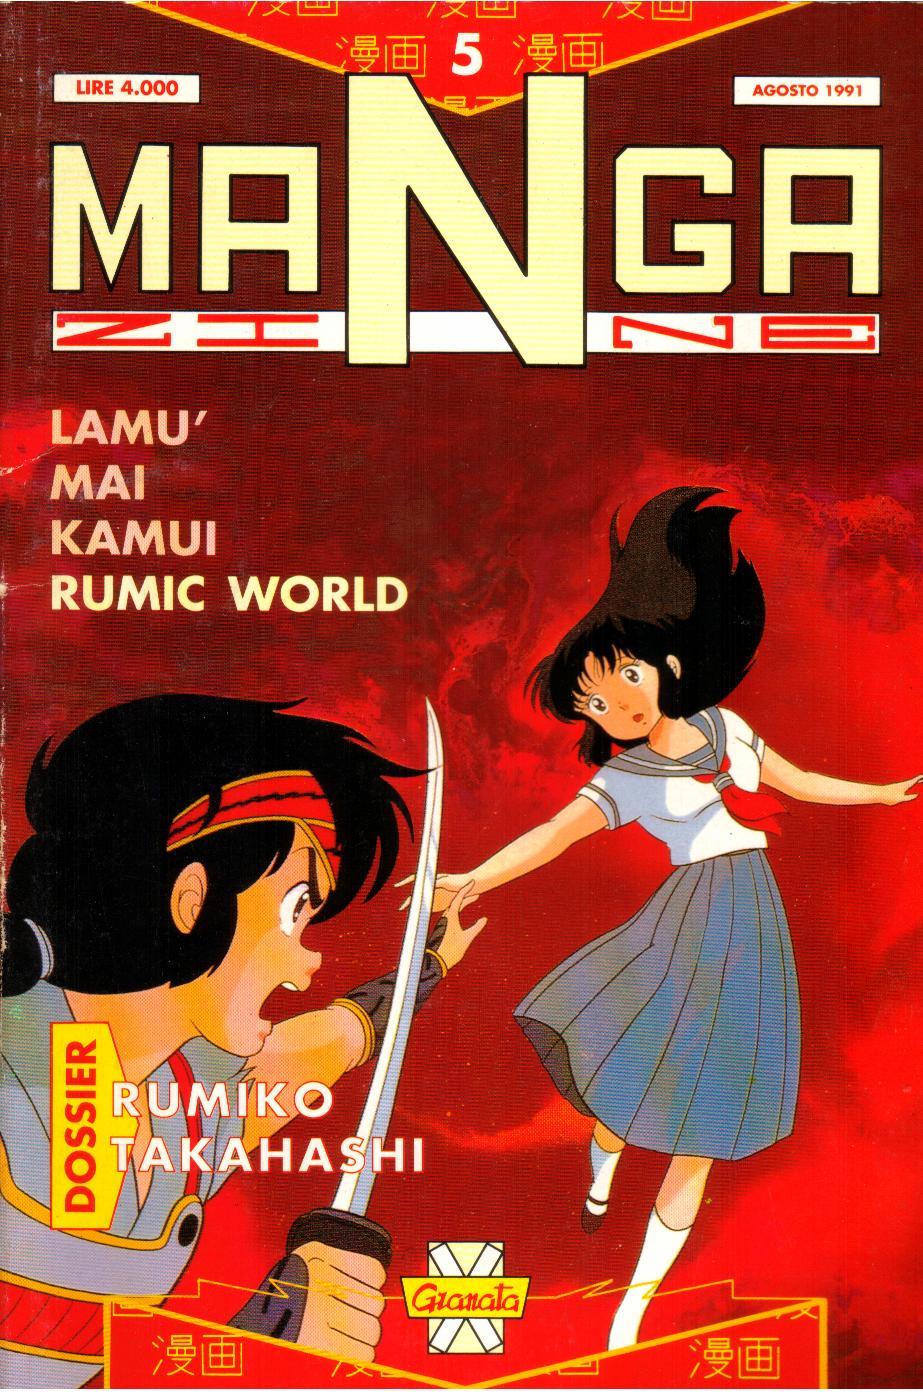 Mangazine n. 5